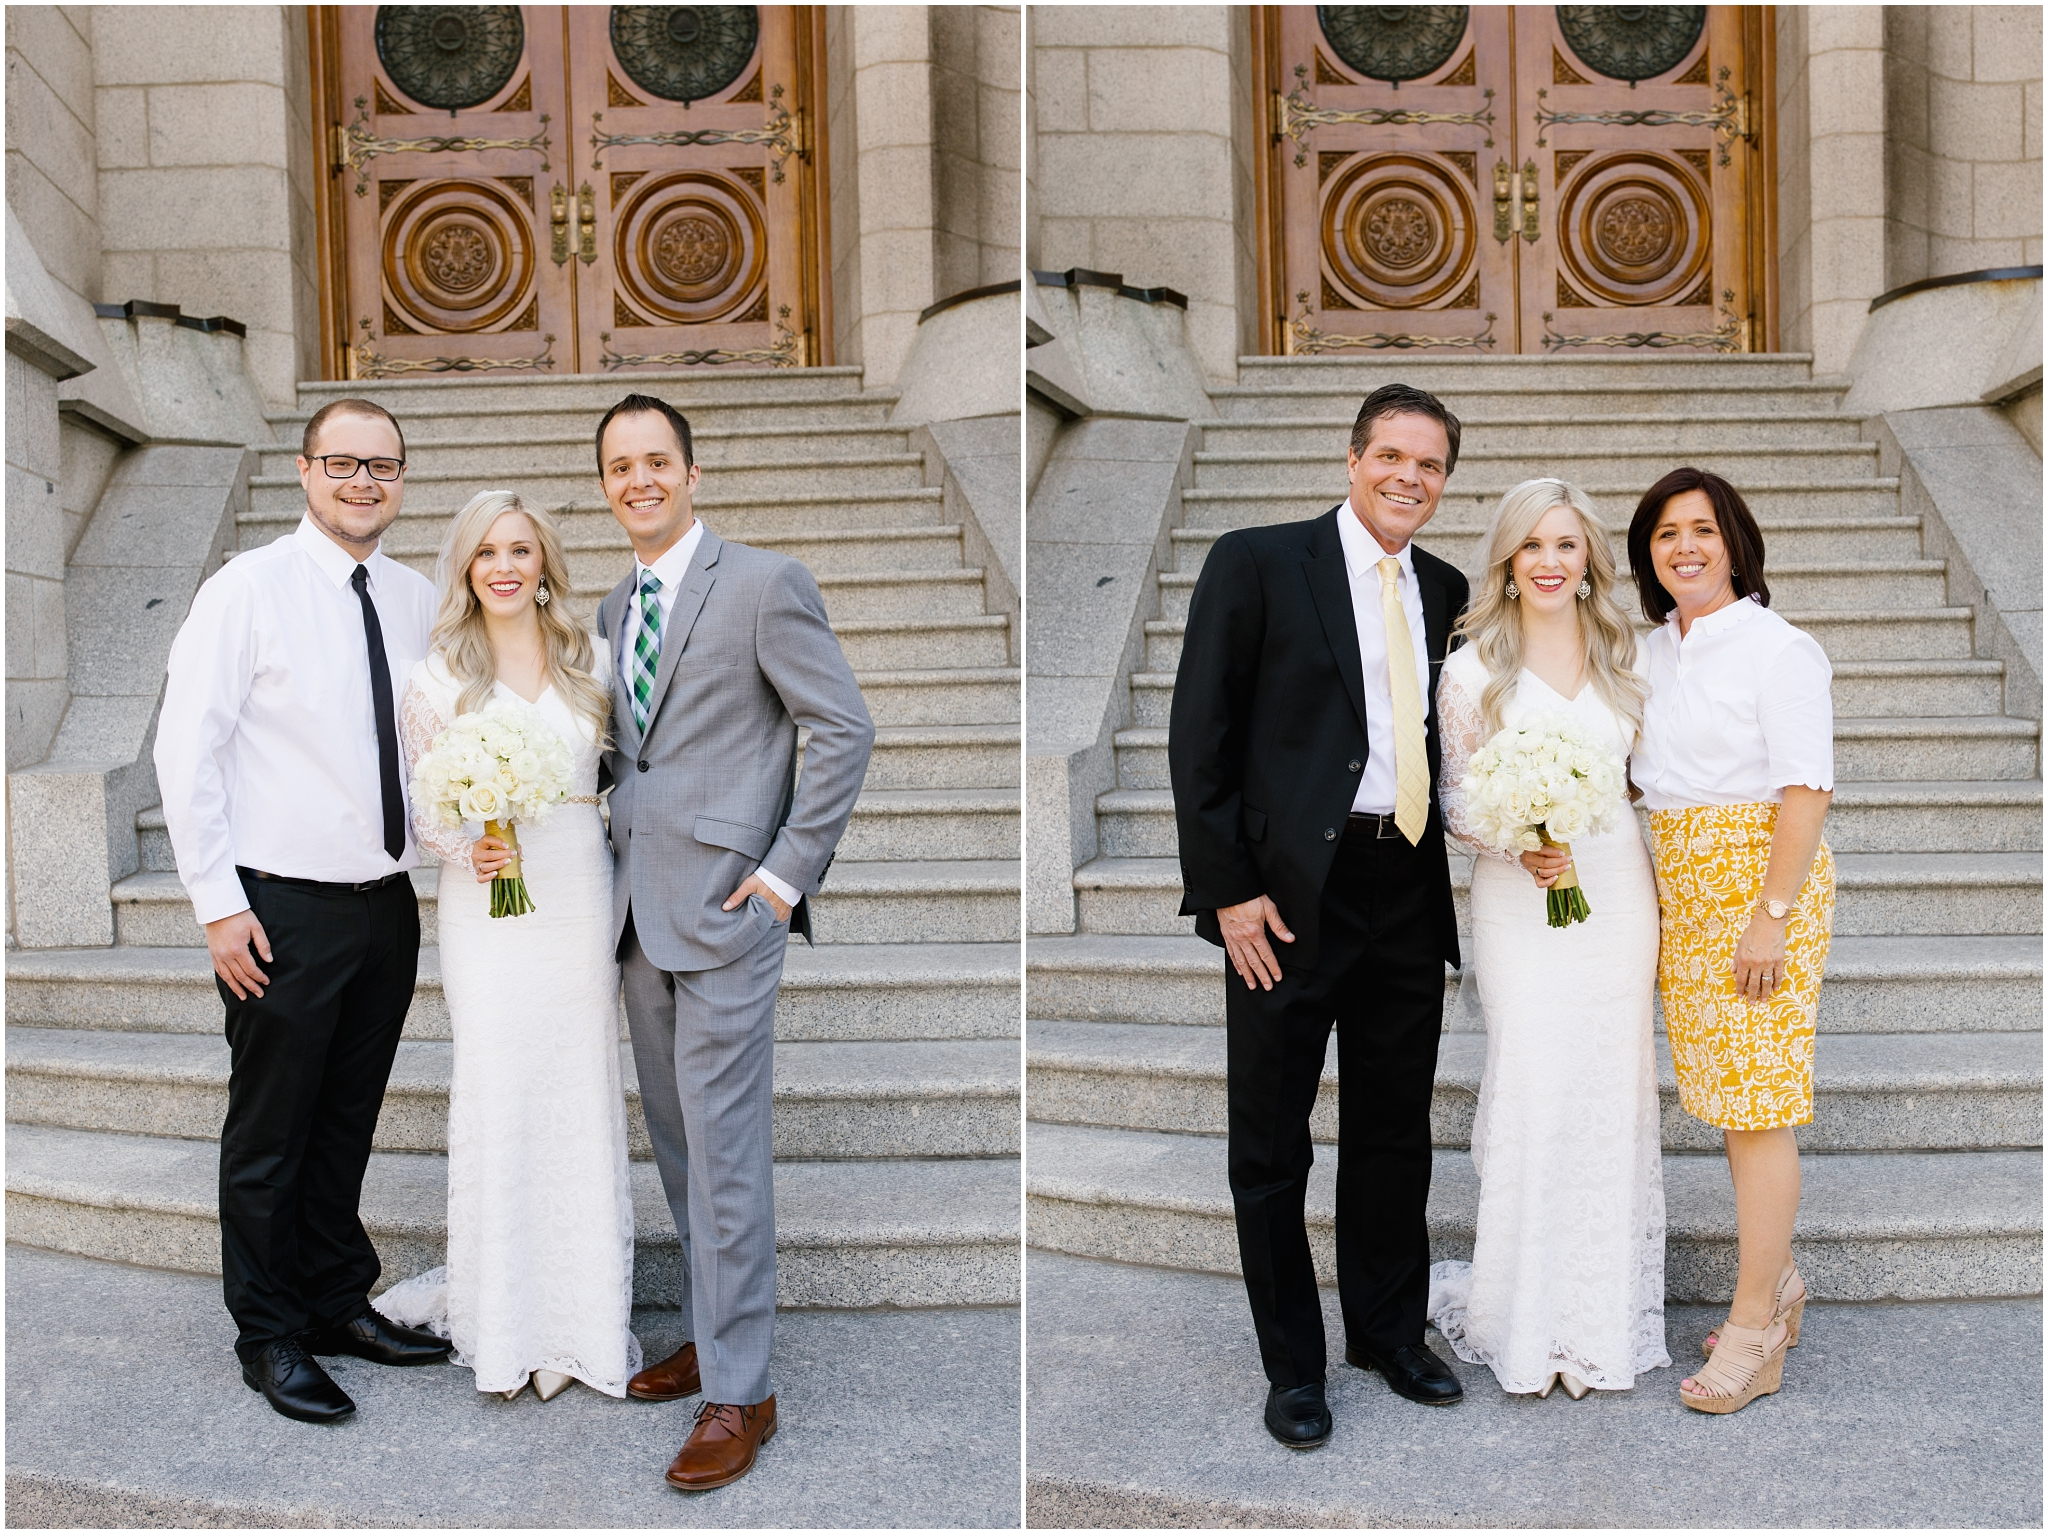 CherylandTyler-89_Lizzie-B-Imagery-Utah-Wedding-Photographer-Salt-Lake-City-Temple-Wells-Fargo-Building-Reception.jpg